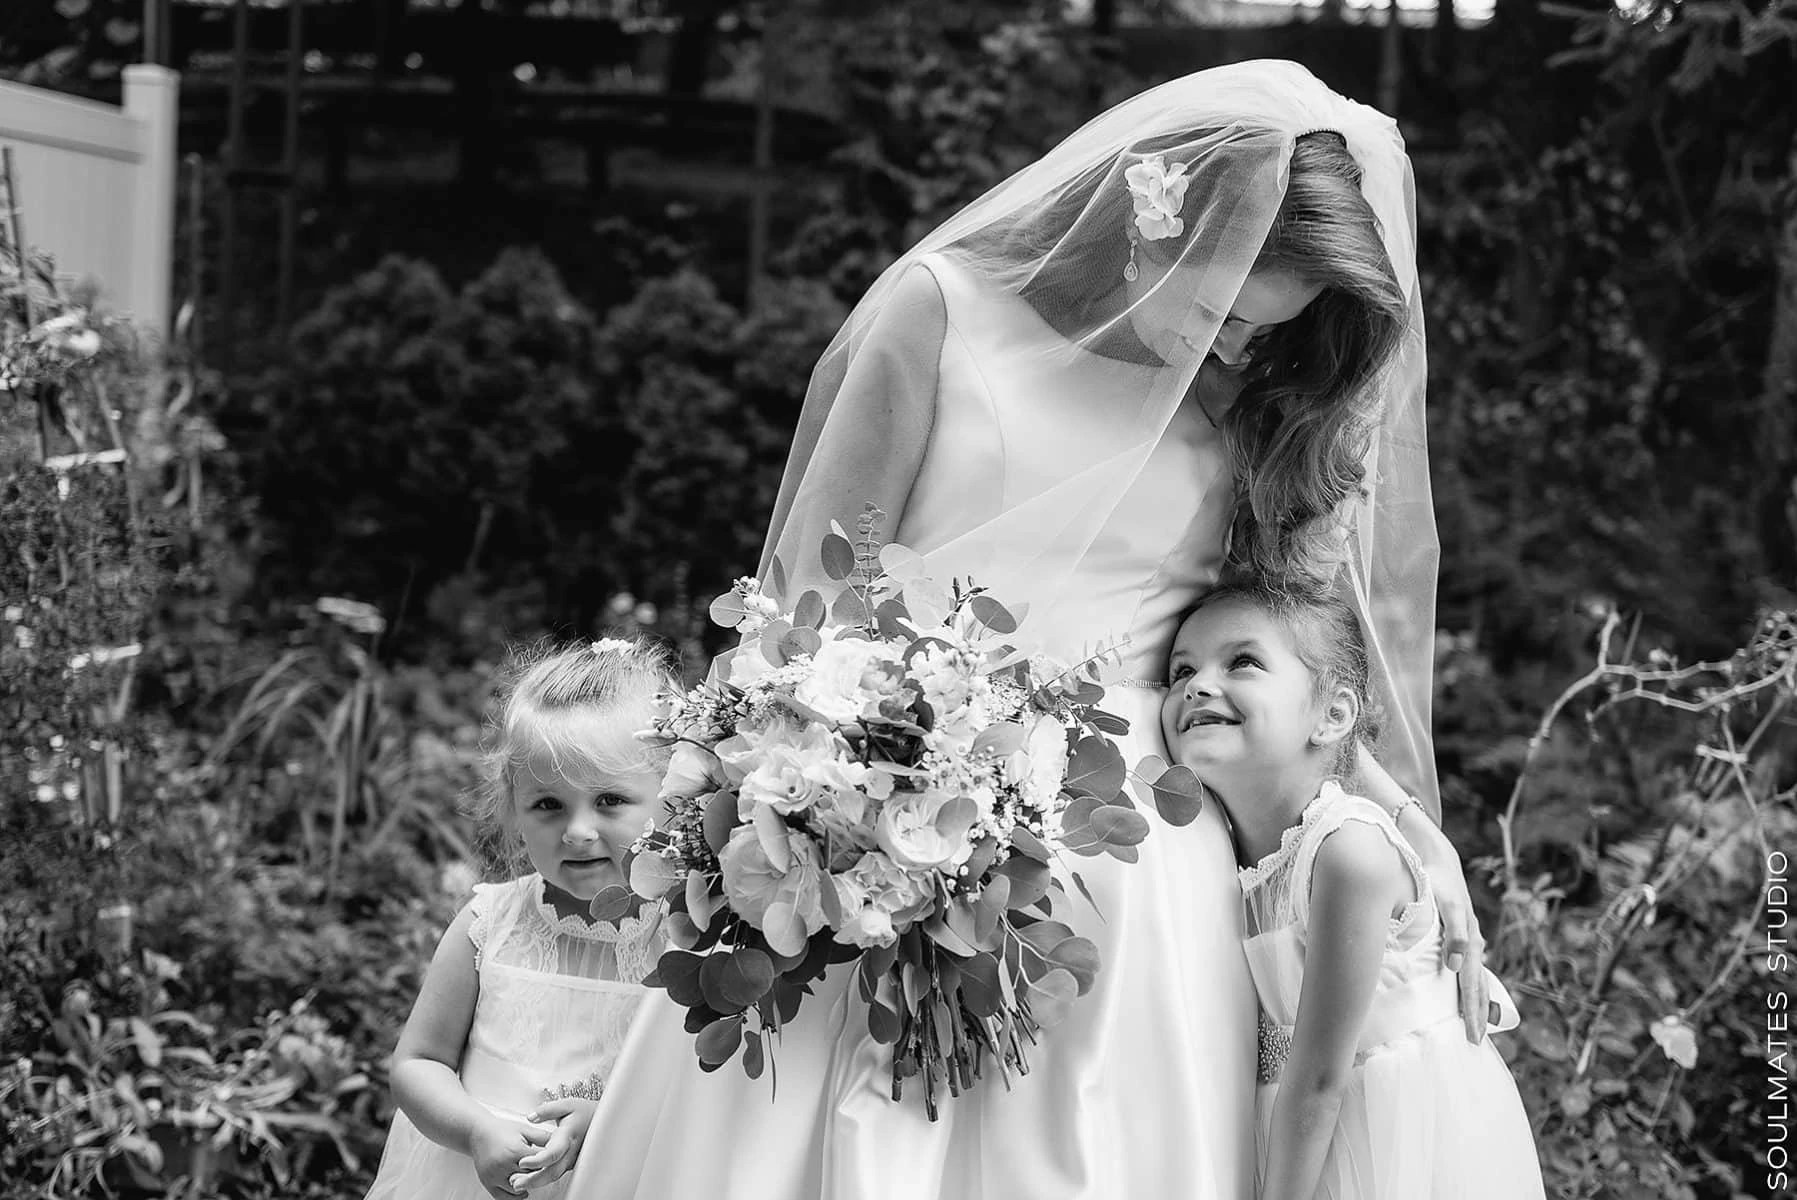 Brooklyn Bride and Flowers girls